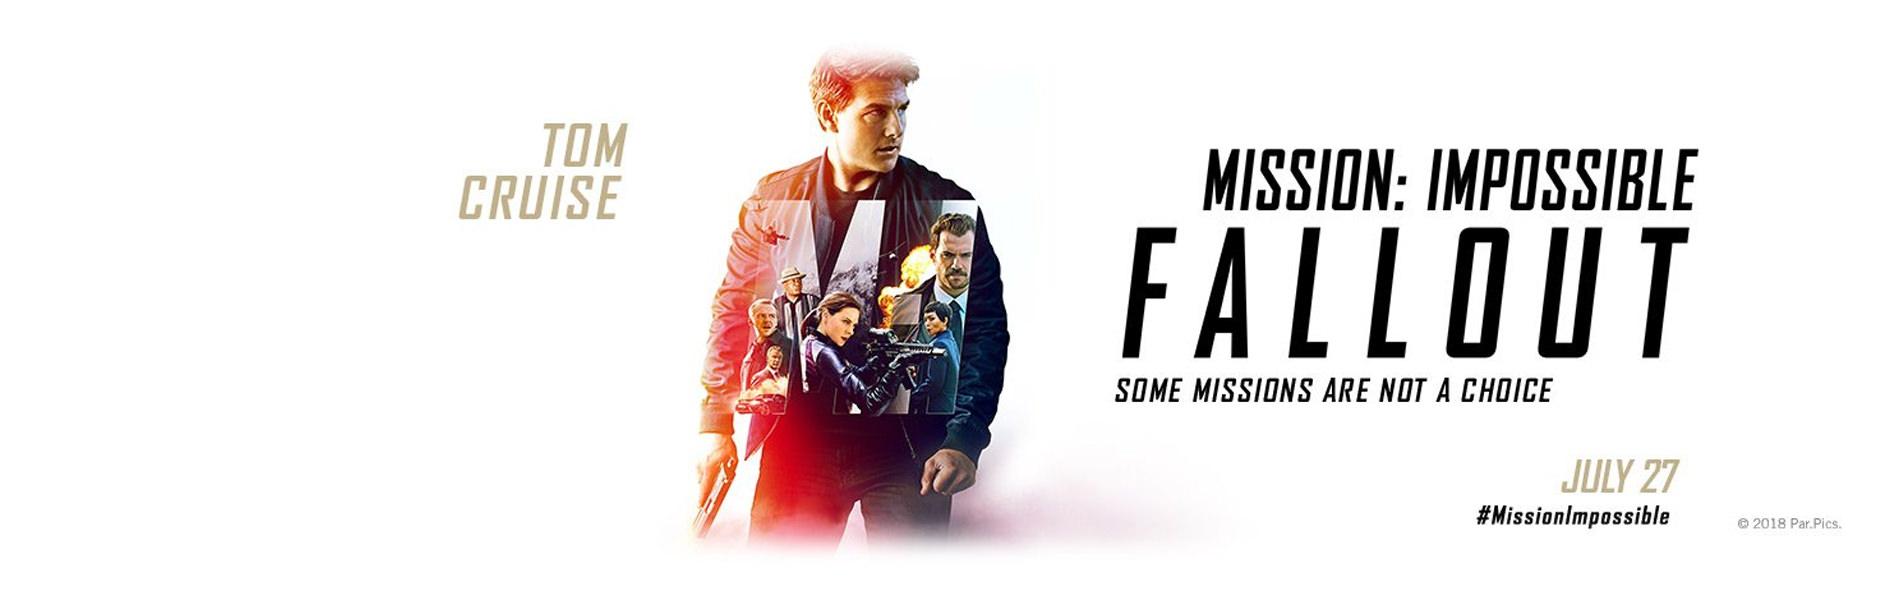 Movie, Mission: Impossible - Fallout(美國, 2018) / 不可能的任務:全面瓦解(台) / 碟中谍6:全面瓦解(中) / 職業特工隊:叛逆之謎(港), 電影海報, 美國, 橫版